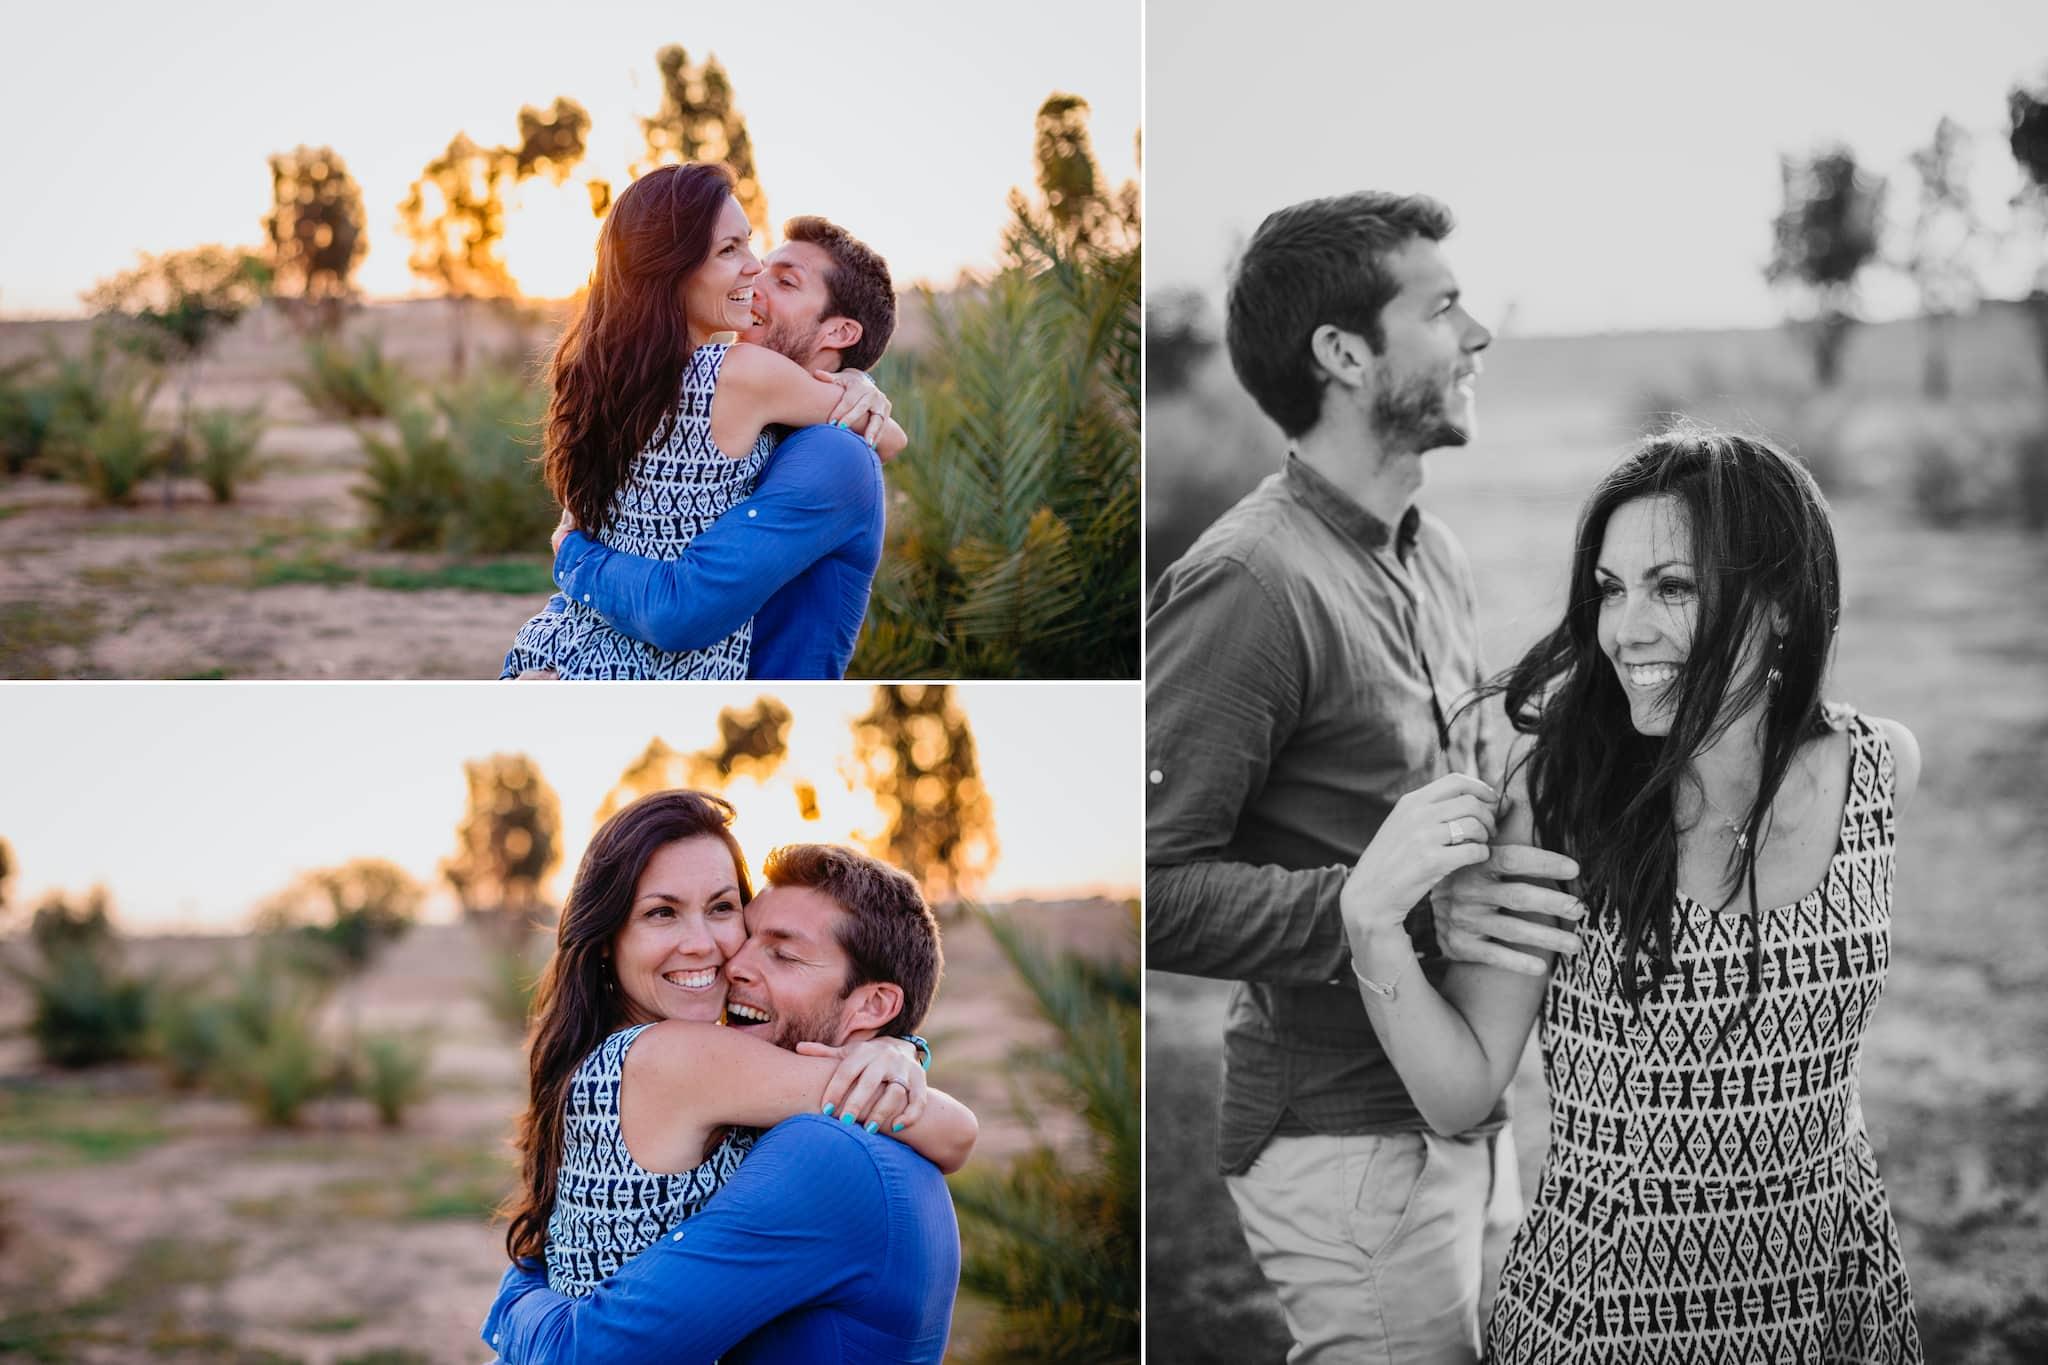 marrakesh ; maroc ; photographe ; séance photo couple